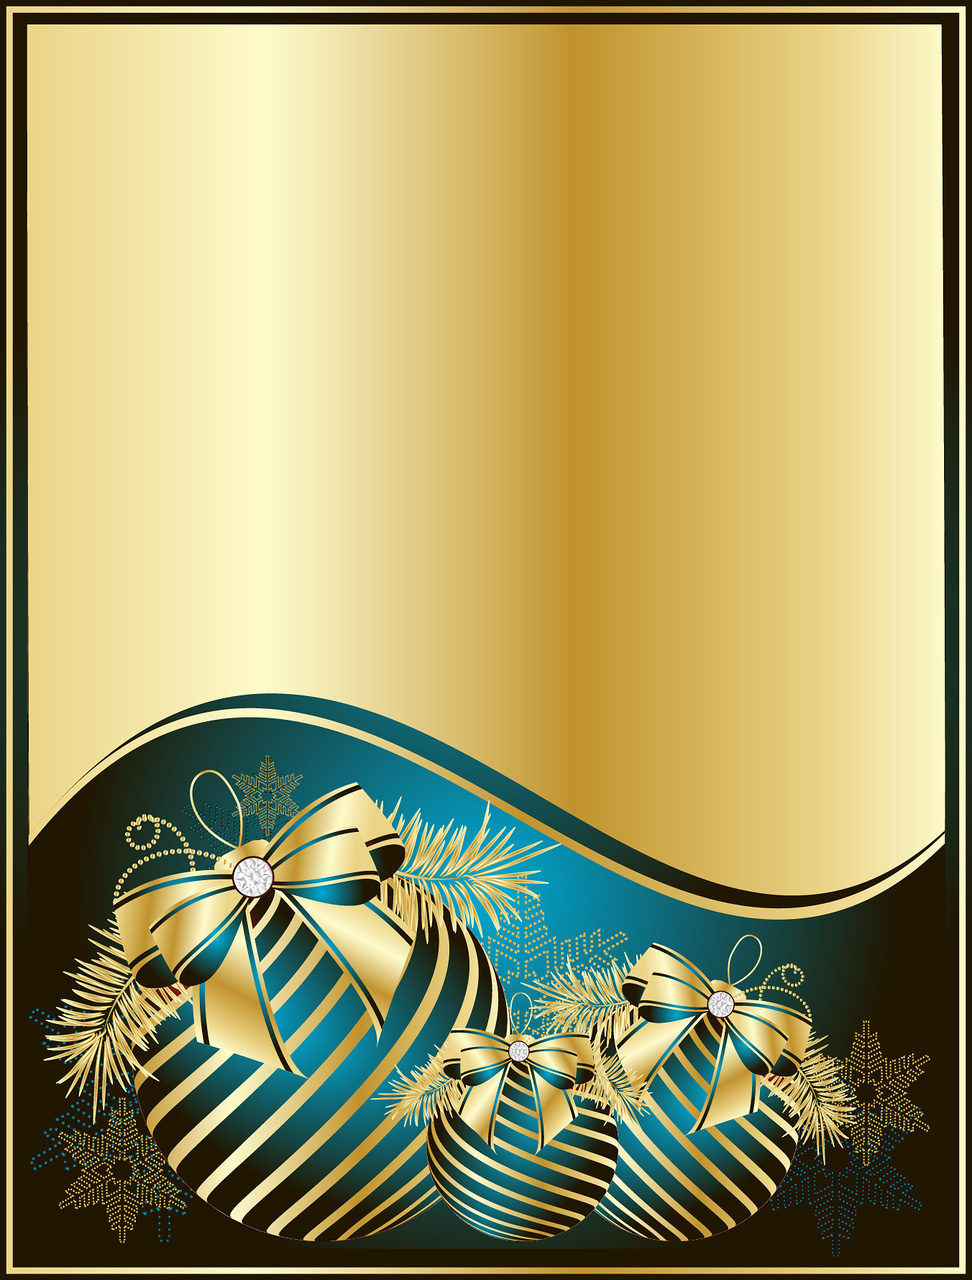 Light Blue and Gold Wallpaper - WallpaperSafari